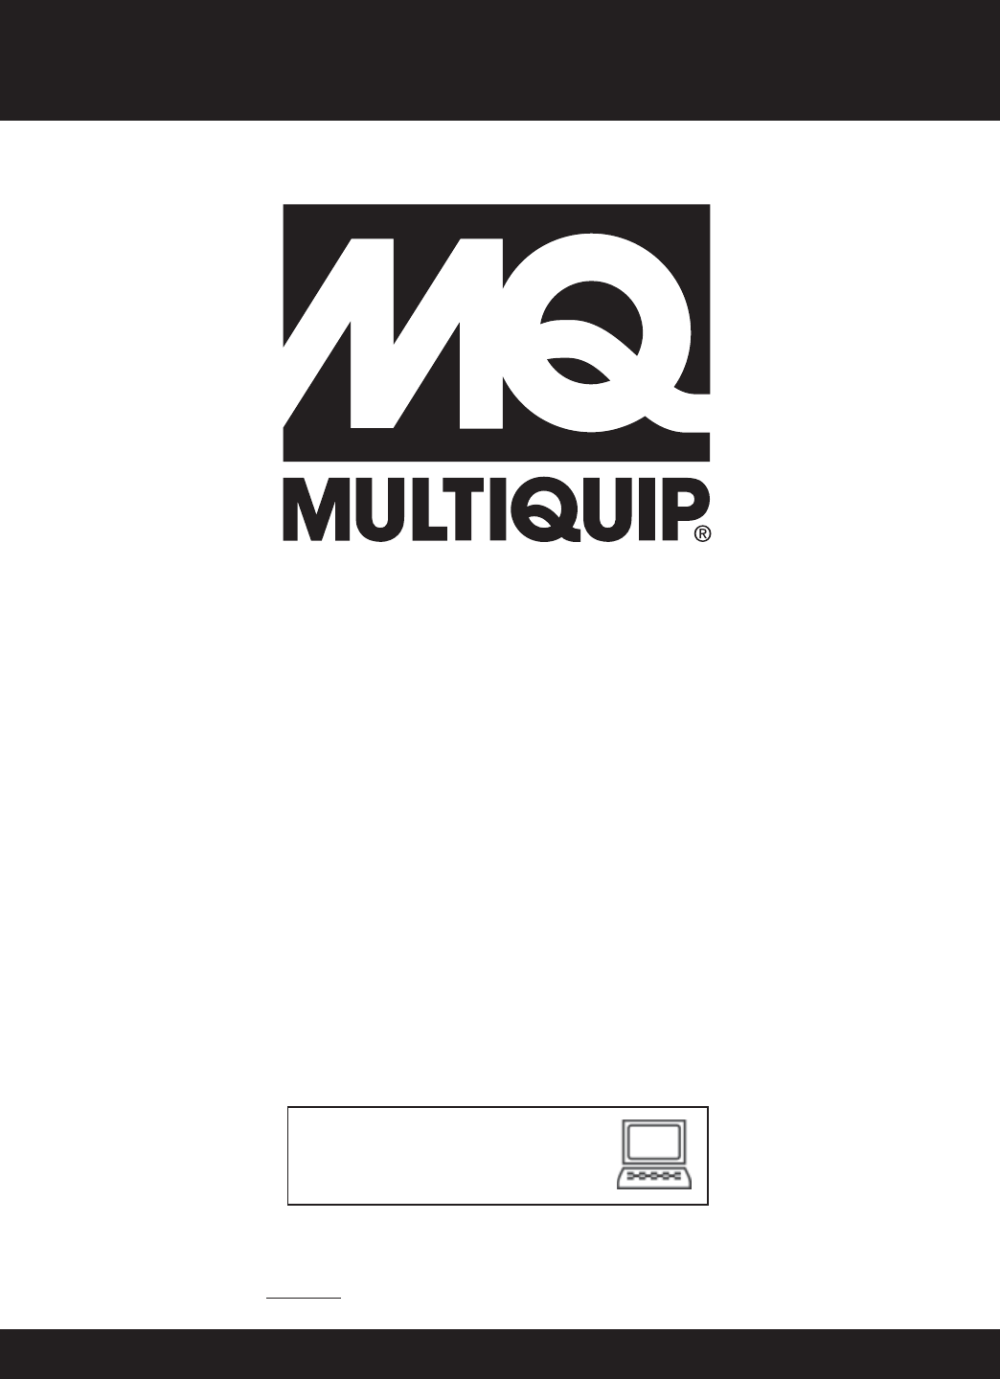 medium resolution of multiquip qp3tz qp 3tz rev 3 pmd user manual 6c7e5390 d492 4c38 ac7b 10292fe0444c